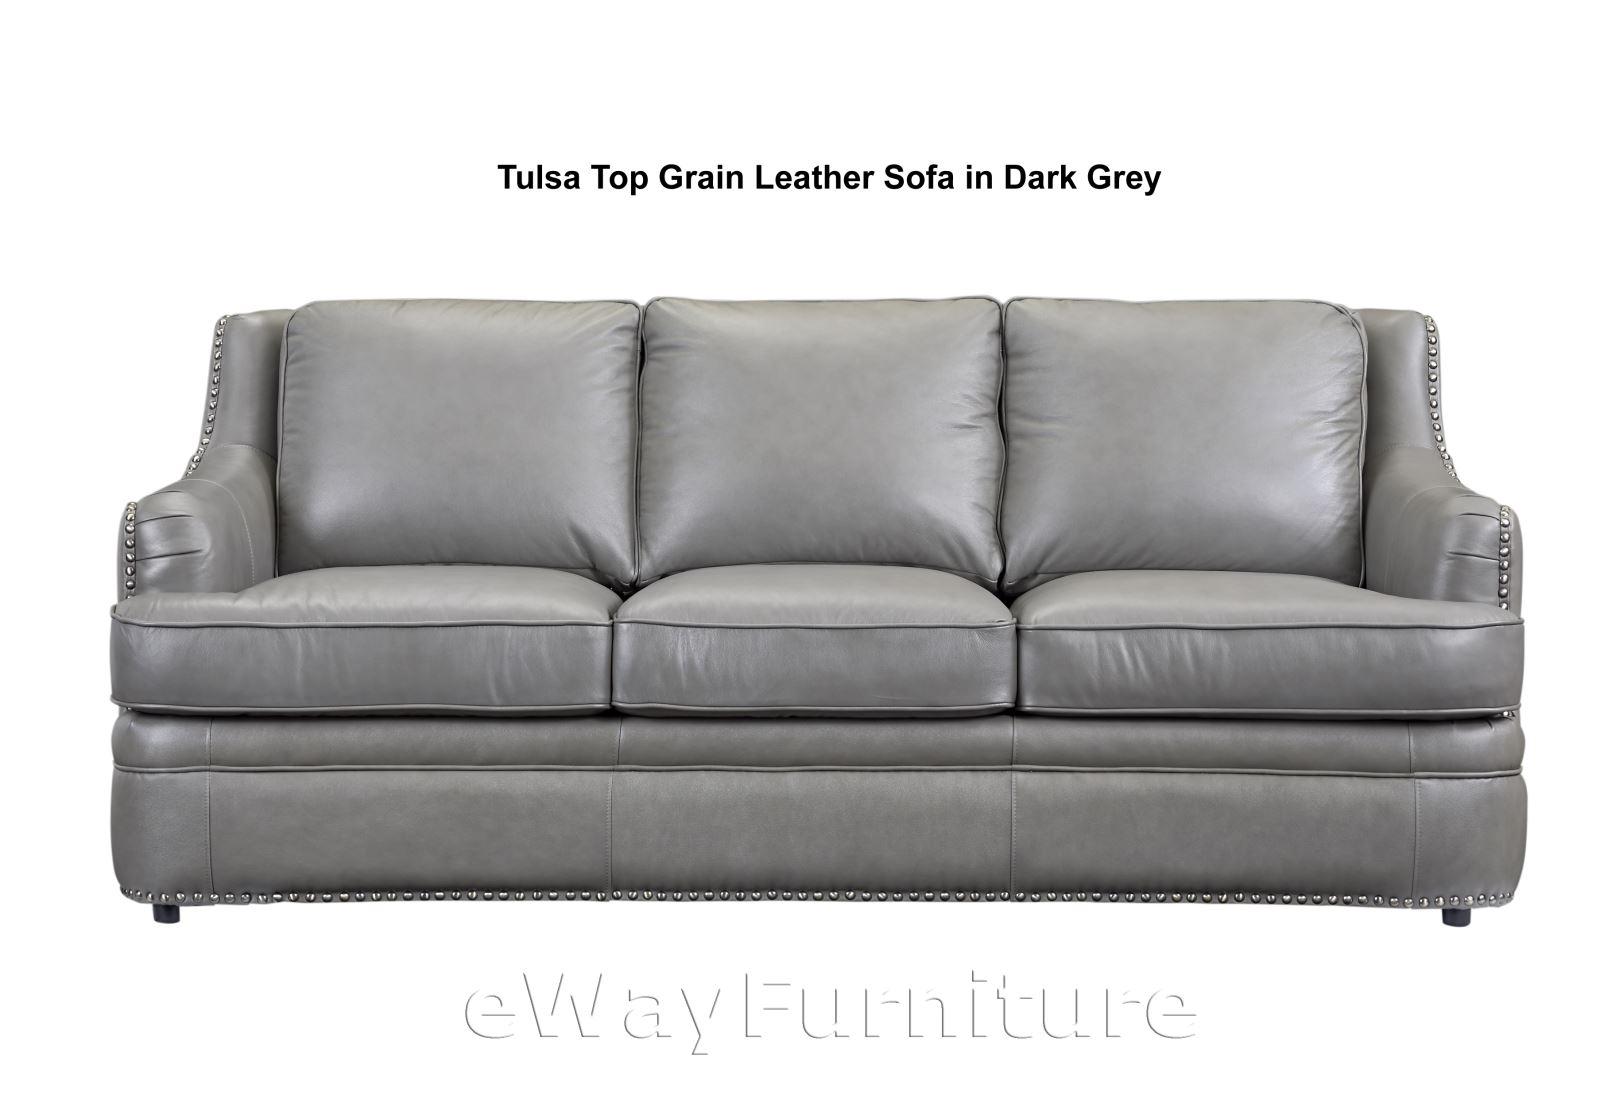 Tulsa Top Grain Leather Sofa In Dark Grey